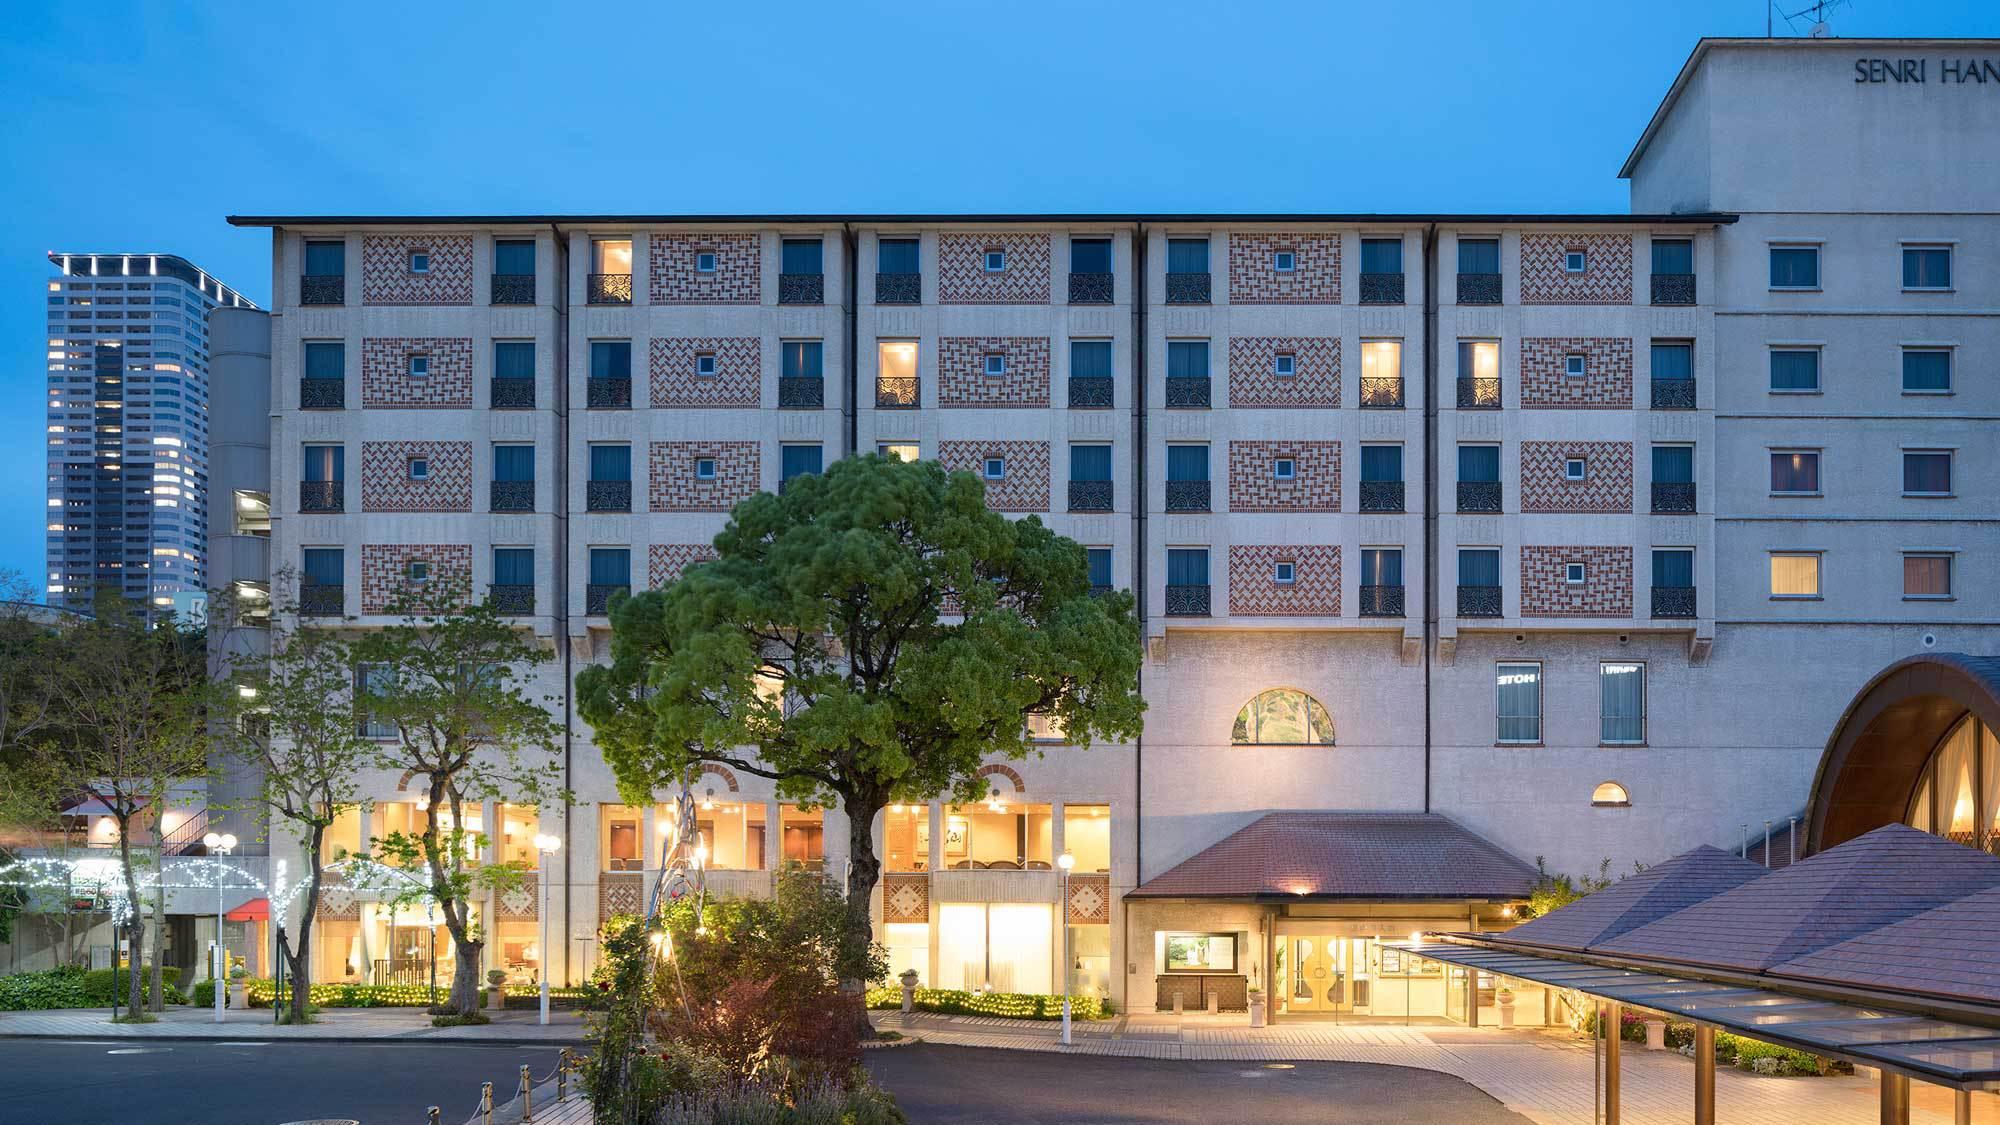 14f478e64b41f2 千里阪急ホテル学術文化都市千里に位置する緑の中のアーバンリゾート。しかも新大阪駅や伊丹空港から20分圏内と交通手段も至極便利な立地条件